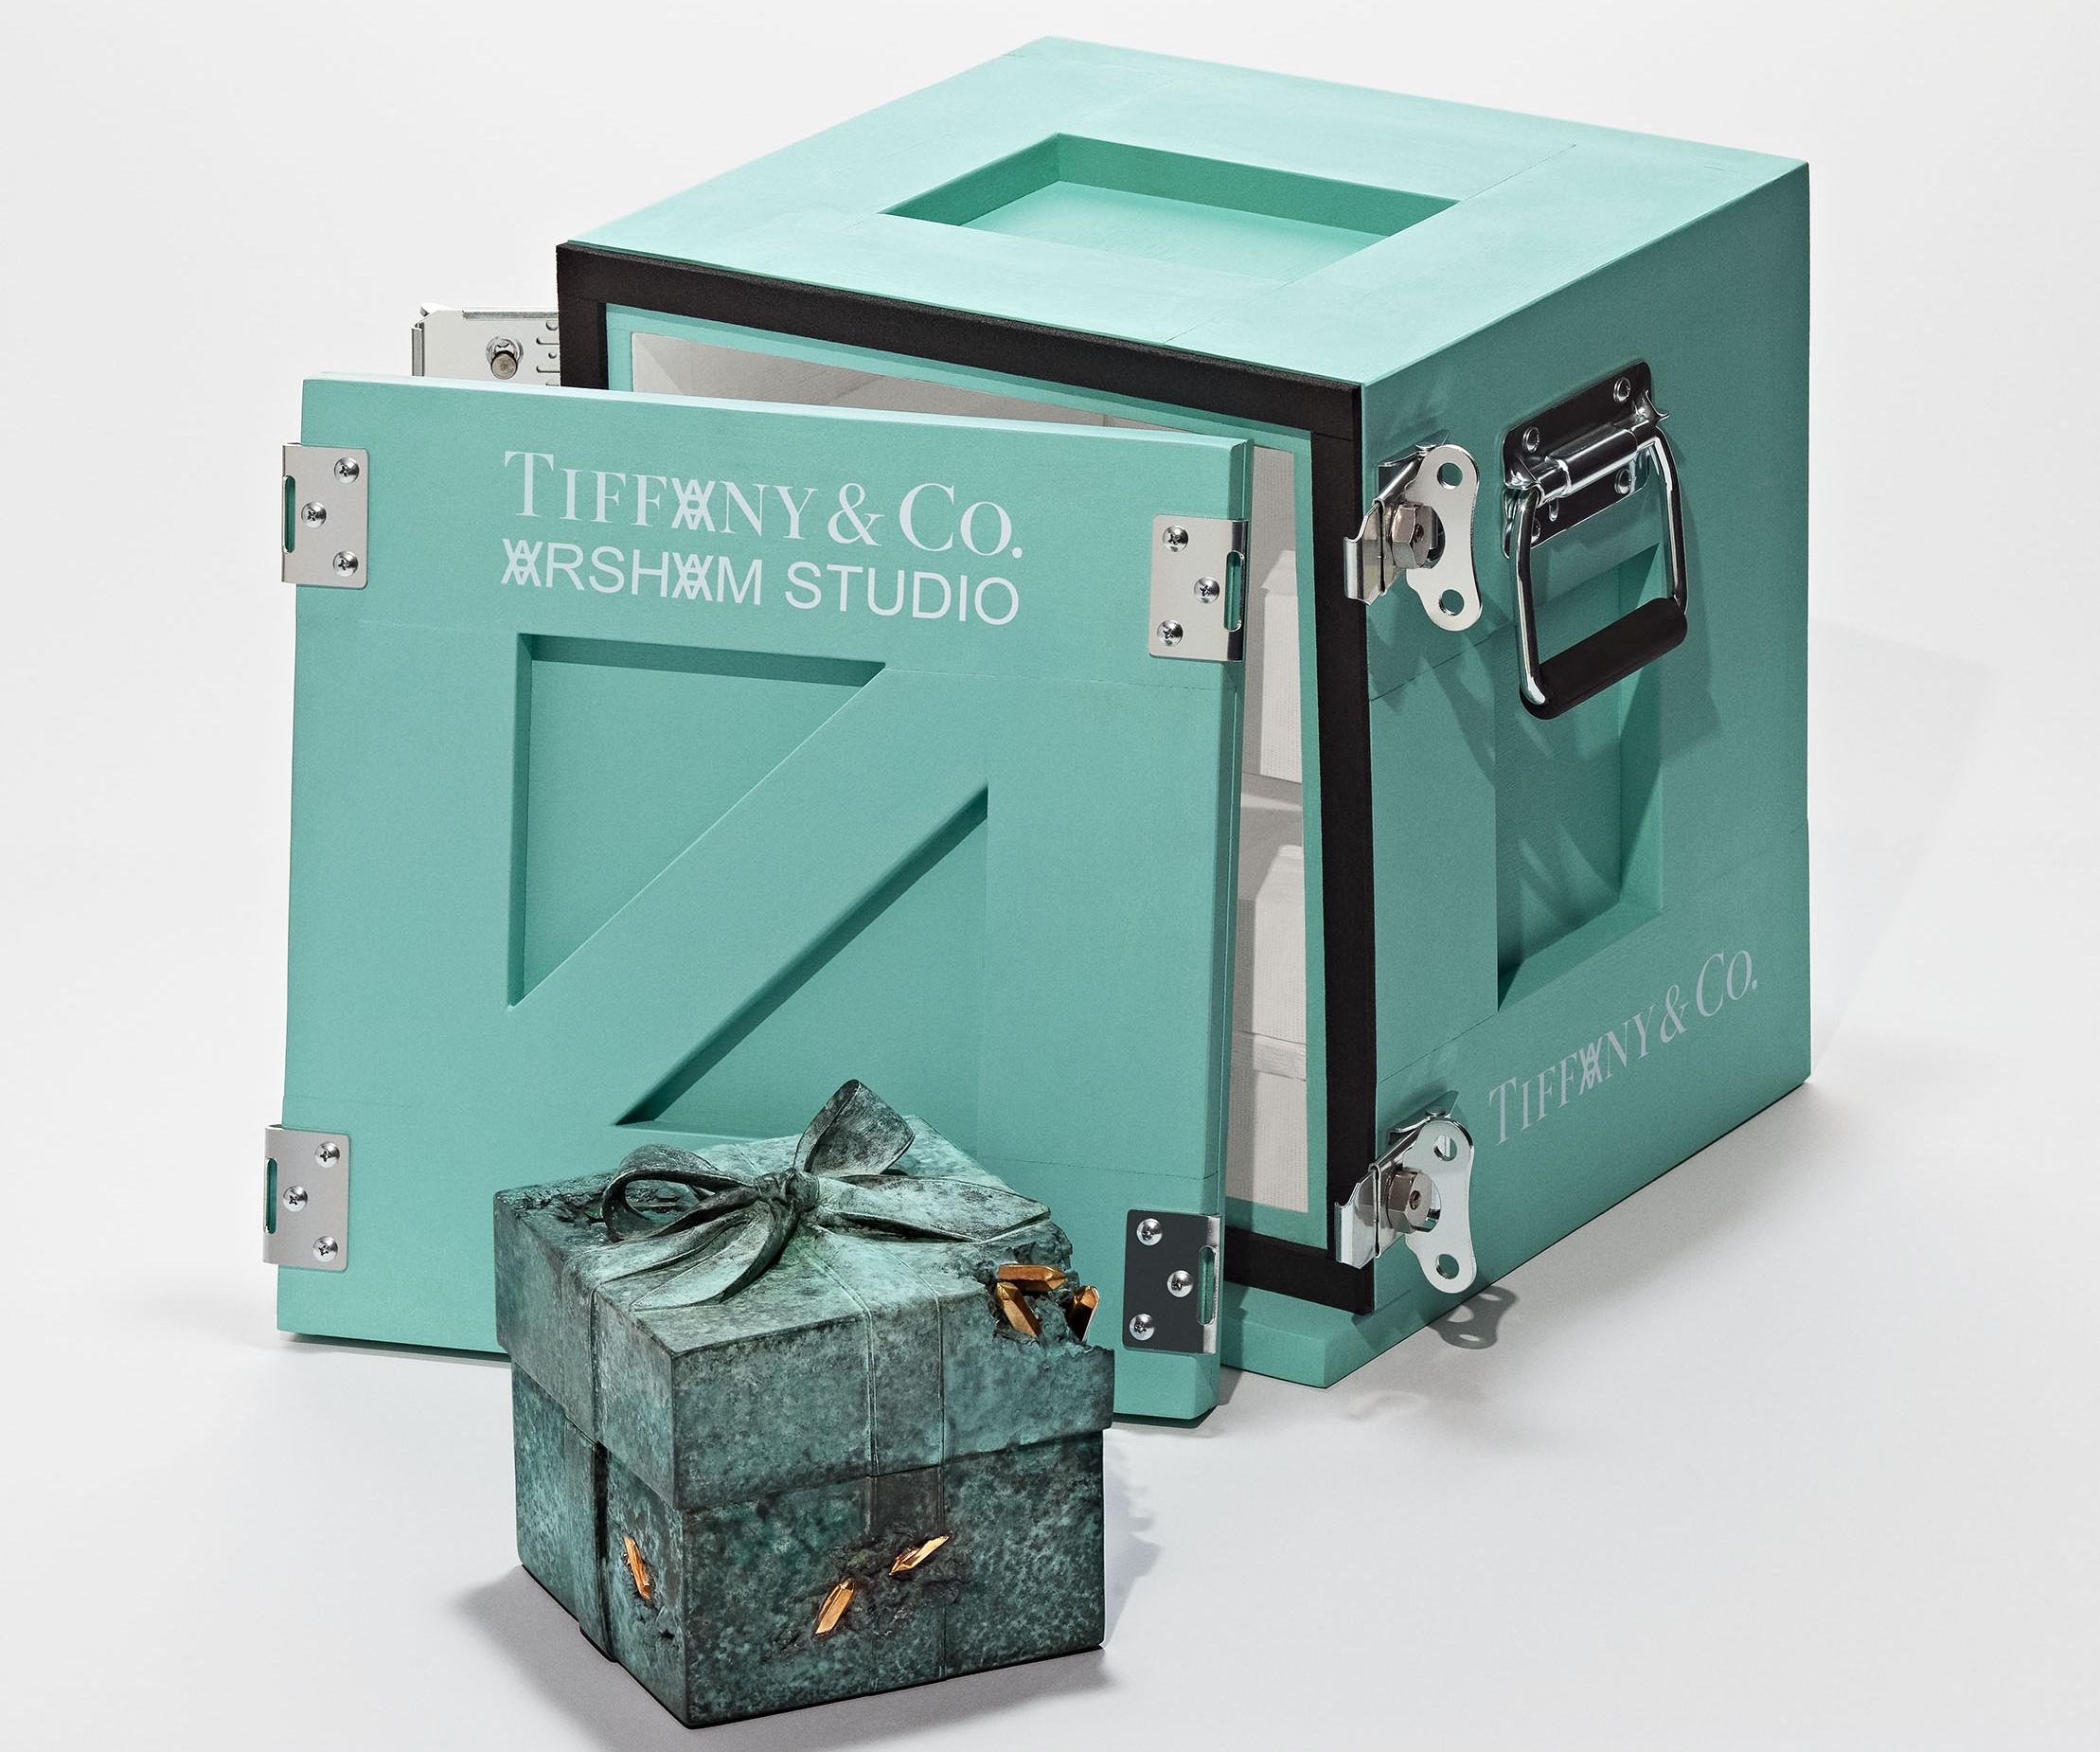 Tiffany & Co Daniel Arsham